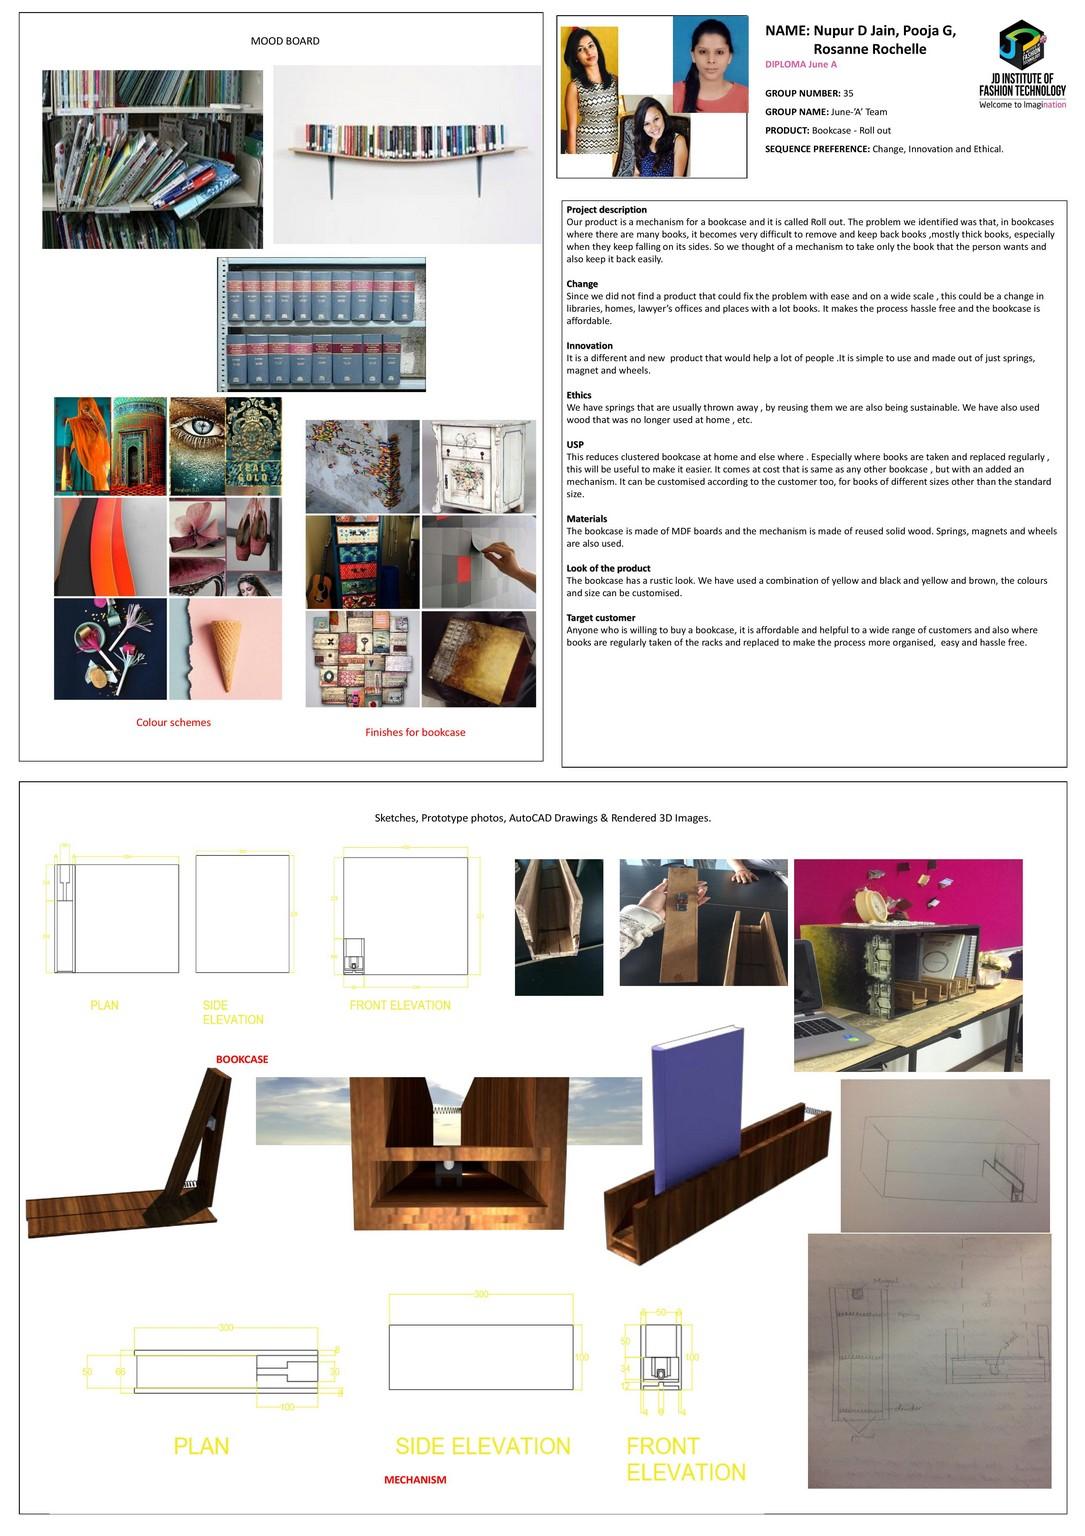 Rustic Bookcase– Change – JD Annual Design Awards 2018 | Designer: Rosanne Rochelle, Pooja G, Nupur D Jain | Photography : Jerin Nath (@jerin_nath)  rustic bookcase - rustic bookcase1 - Rustic Bookcase– Change – JD Annual Design Awards 2018